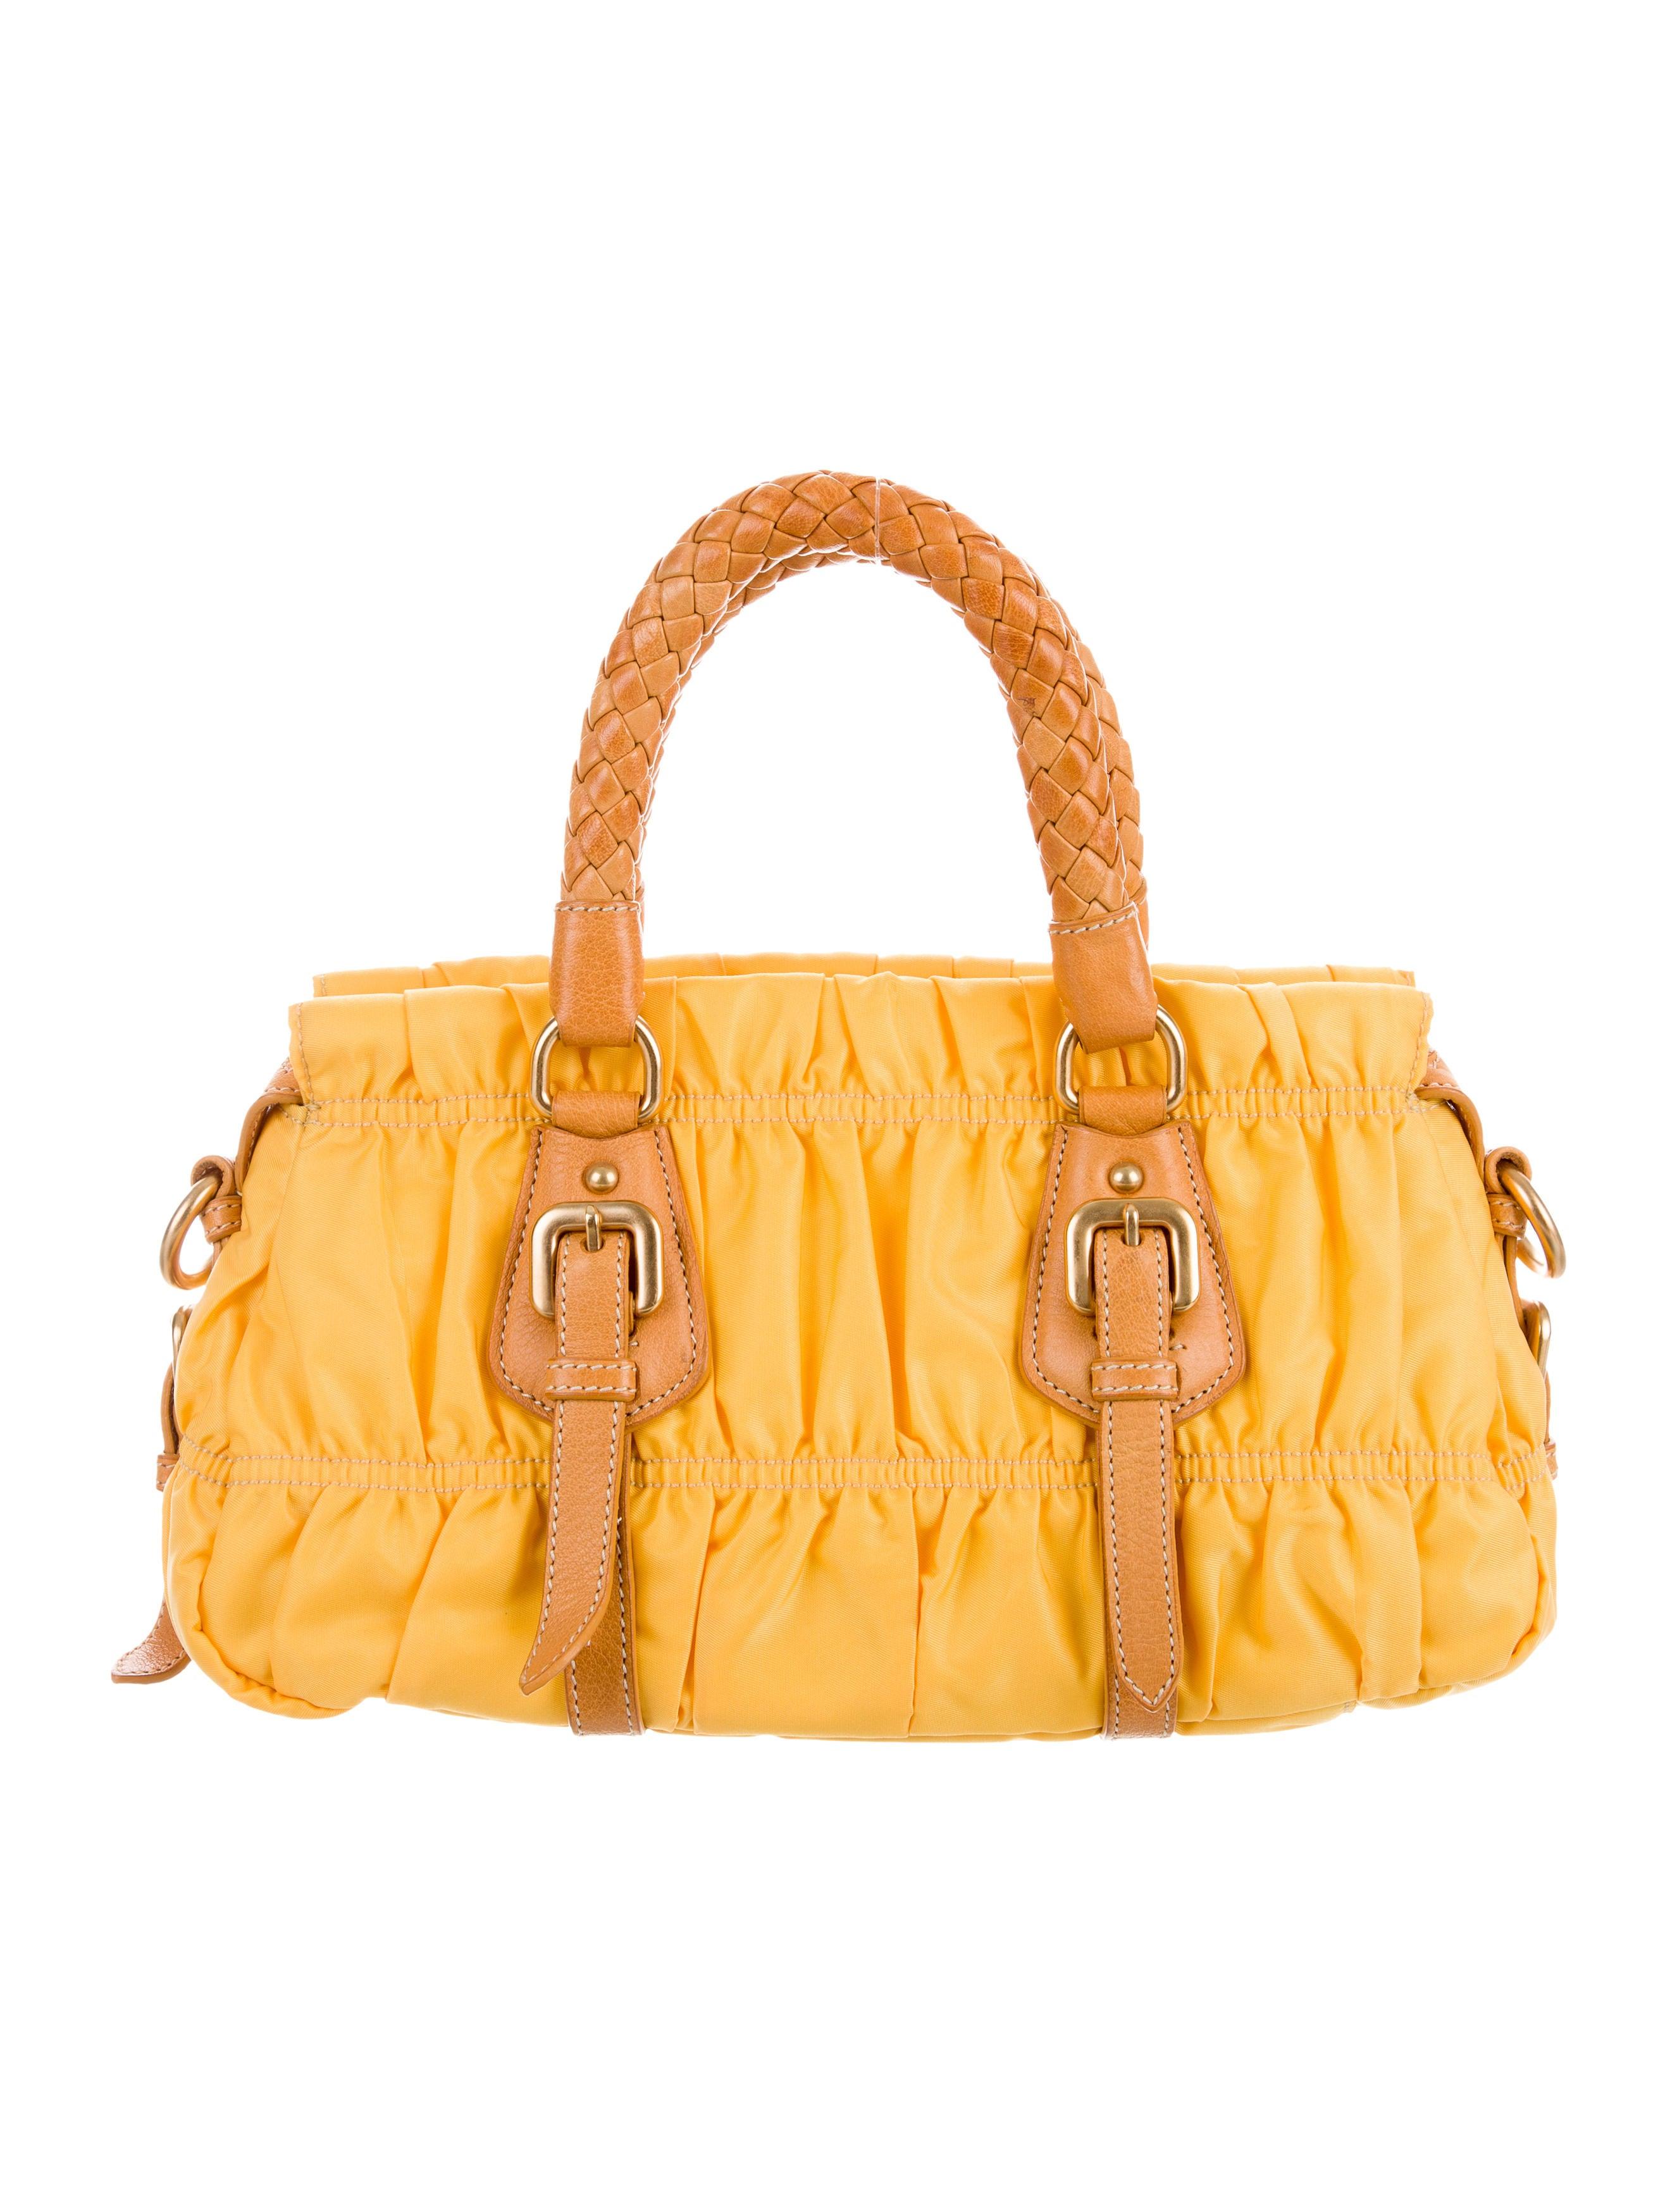 306b94110a66 Prada Tessuto Gaufre Satchel - Handbags - PRA184352   The RealReal